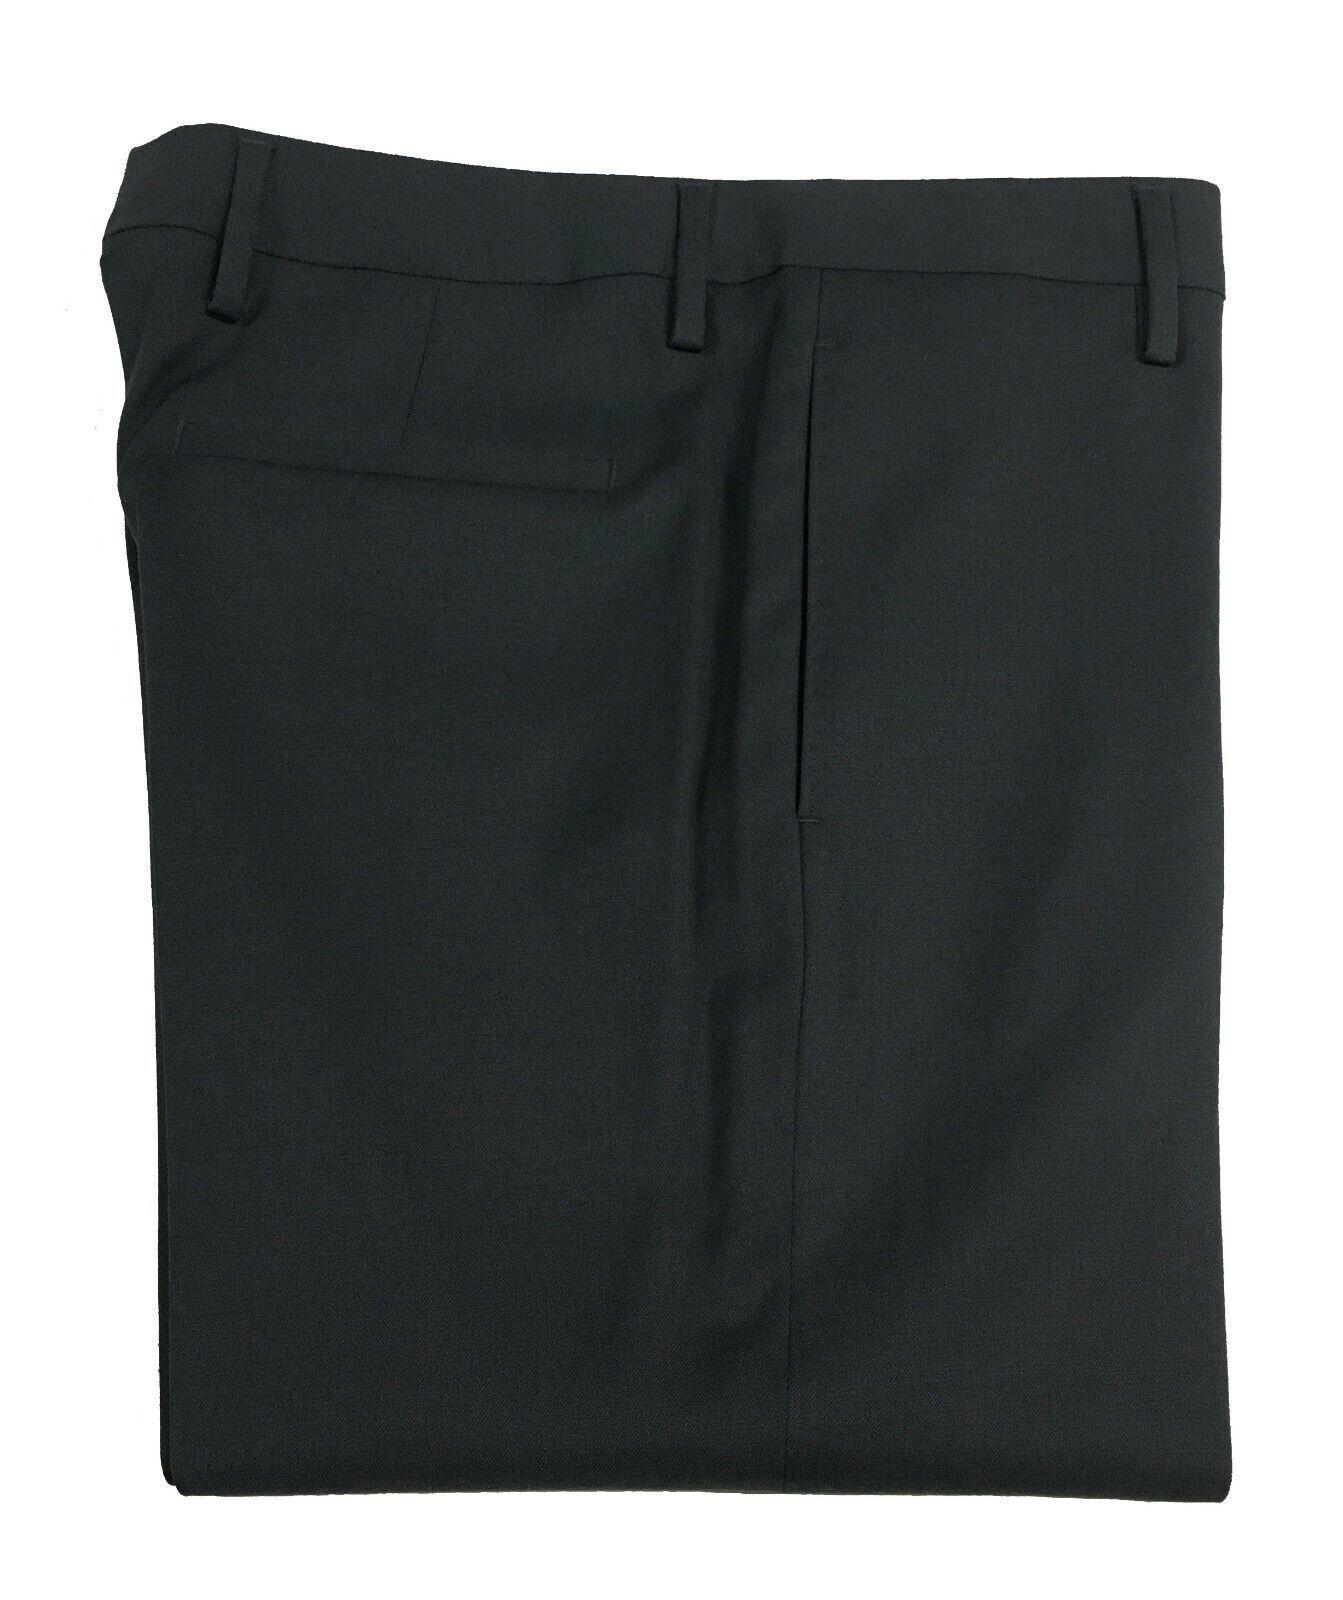 MAURO GRIFONI pantalone uomo grigio tessuto diagonale flanella pesante